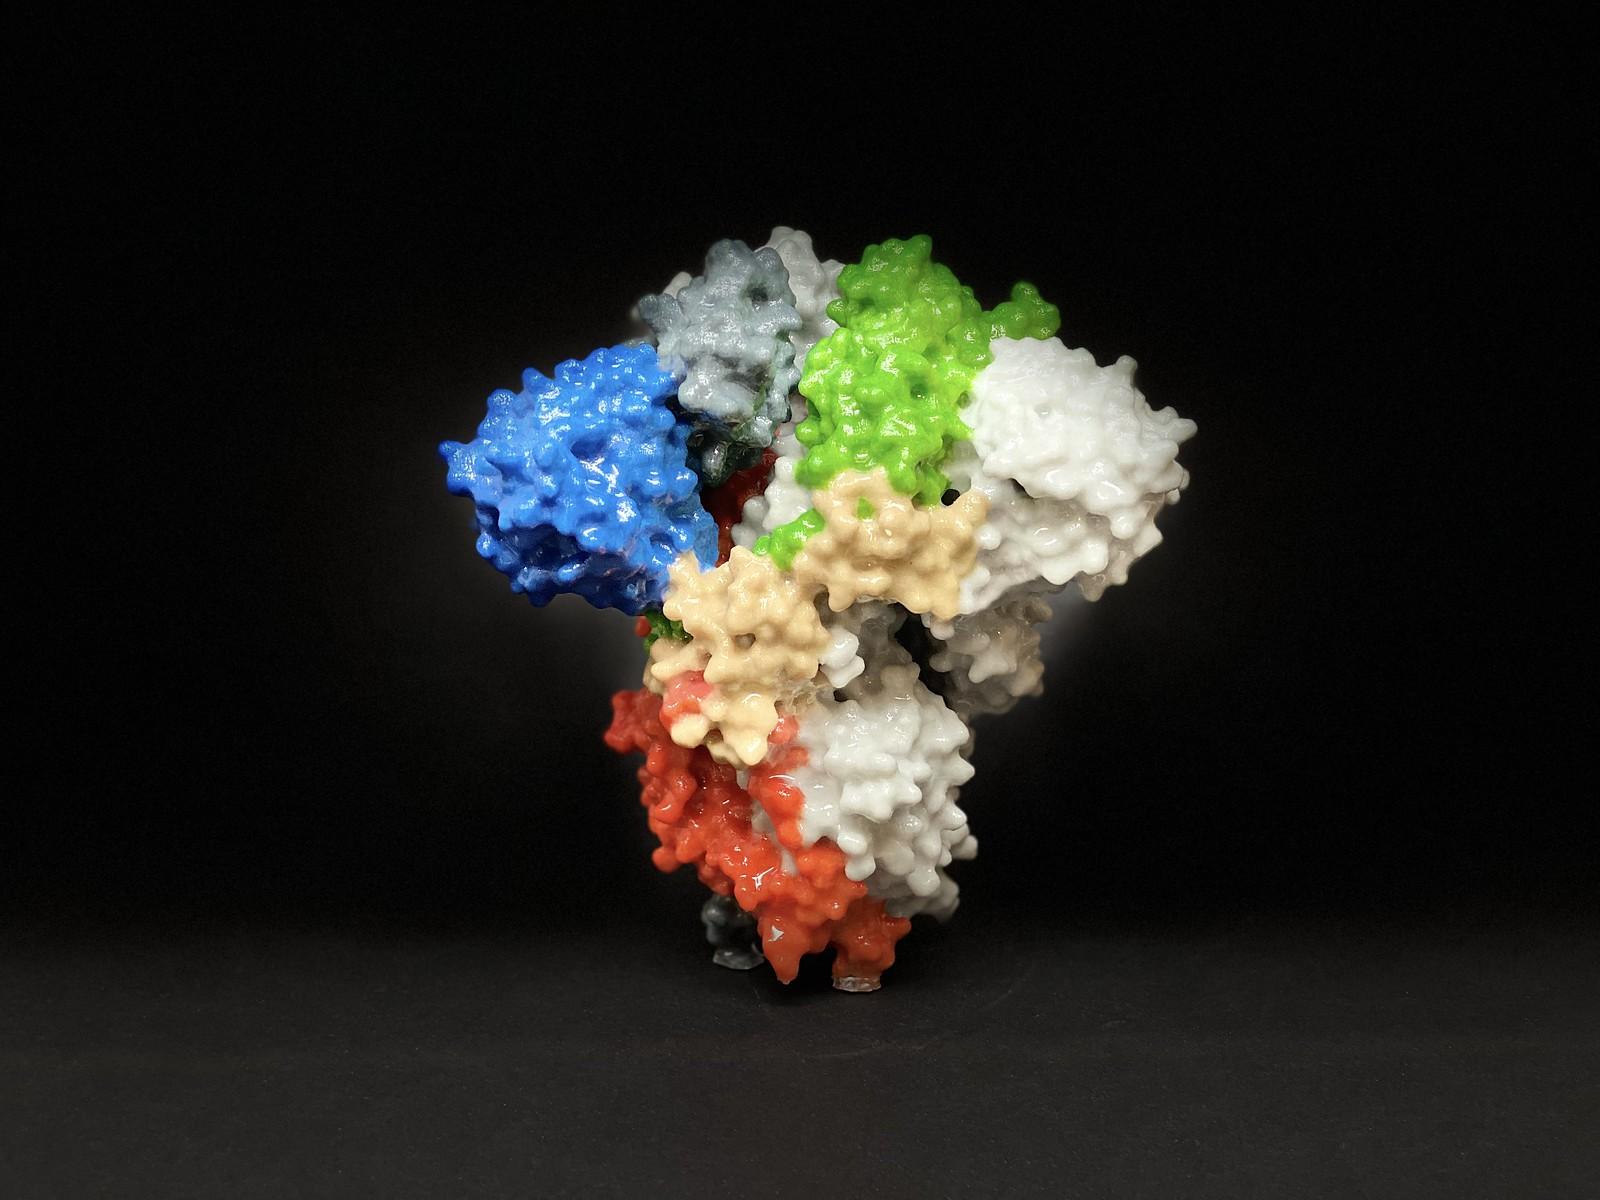 "Шиповидный белок коронавируса SARS-CoV-2. Пластиковая модель. Фото: <a href=""https://www.nih.gov/"" rel=""noopener"" target=""_blank"">NIH</a>."